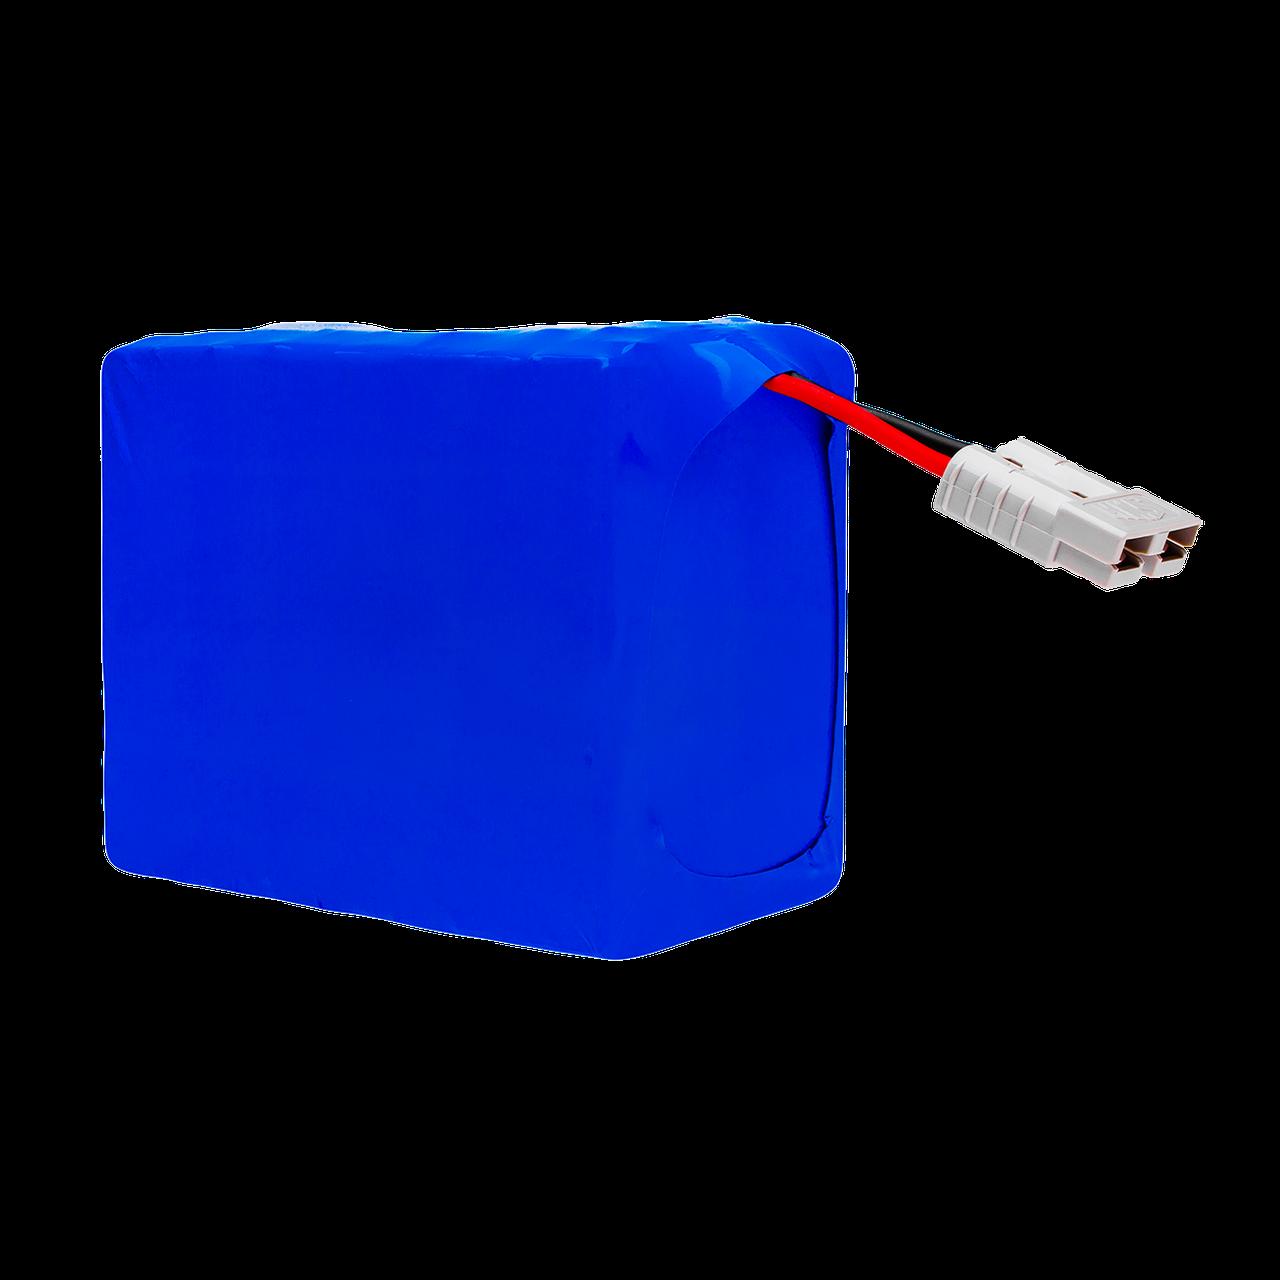 Аккумулятор LP Li-ion 18650 12V-13.6 Ah (12-14 Ah) (BMS 10A)